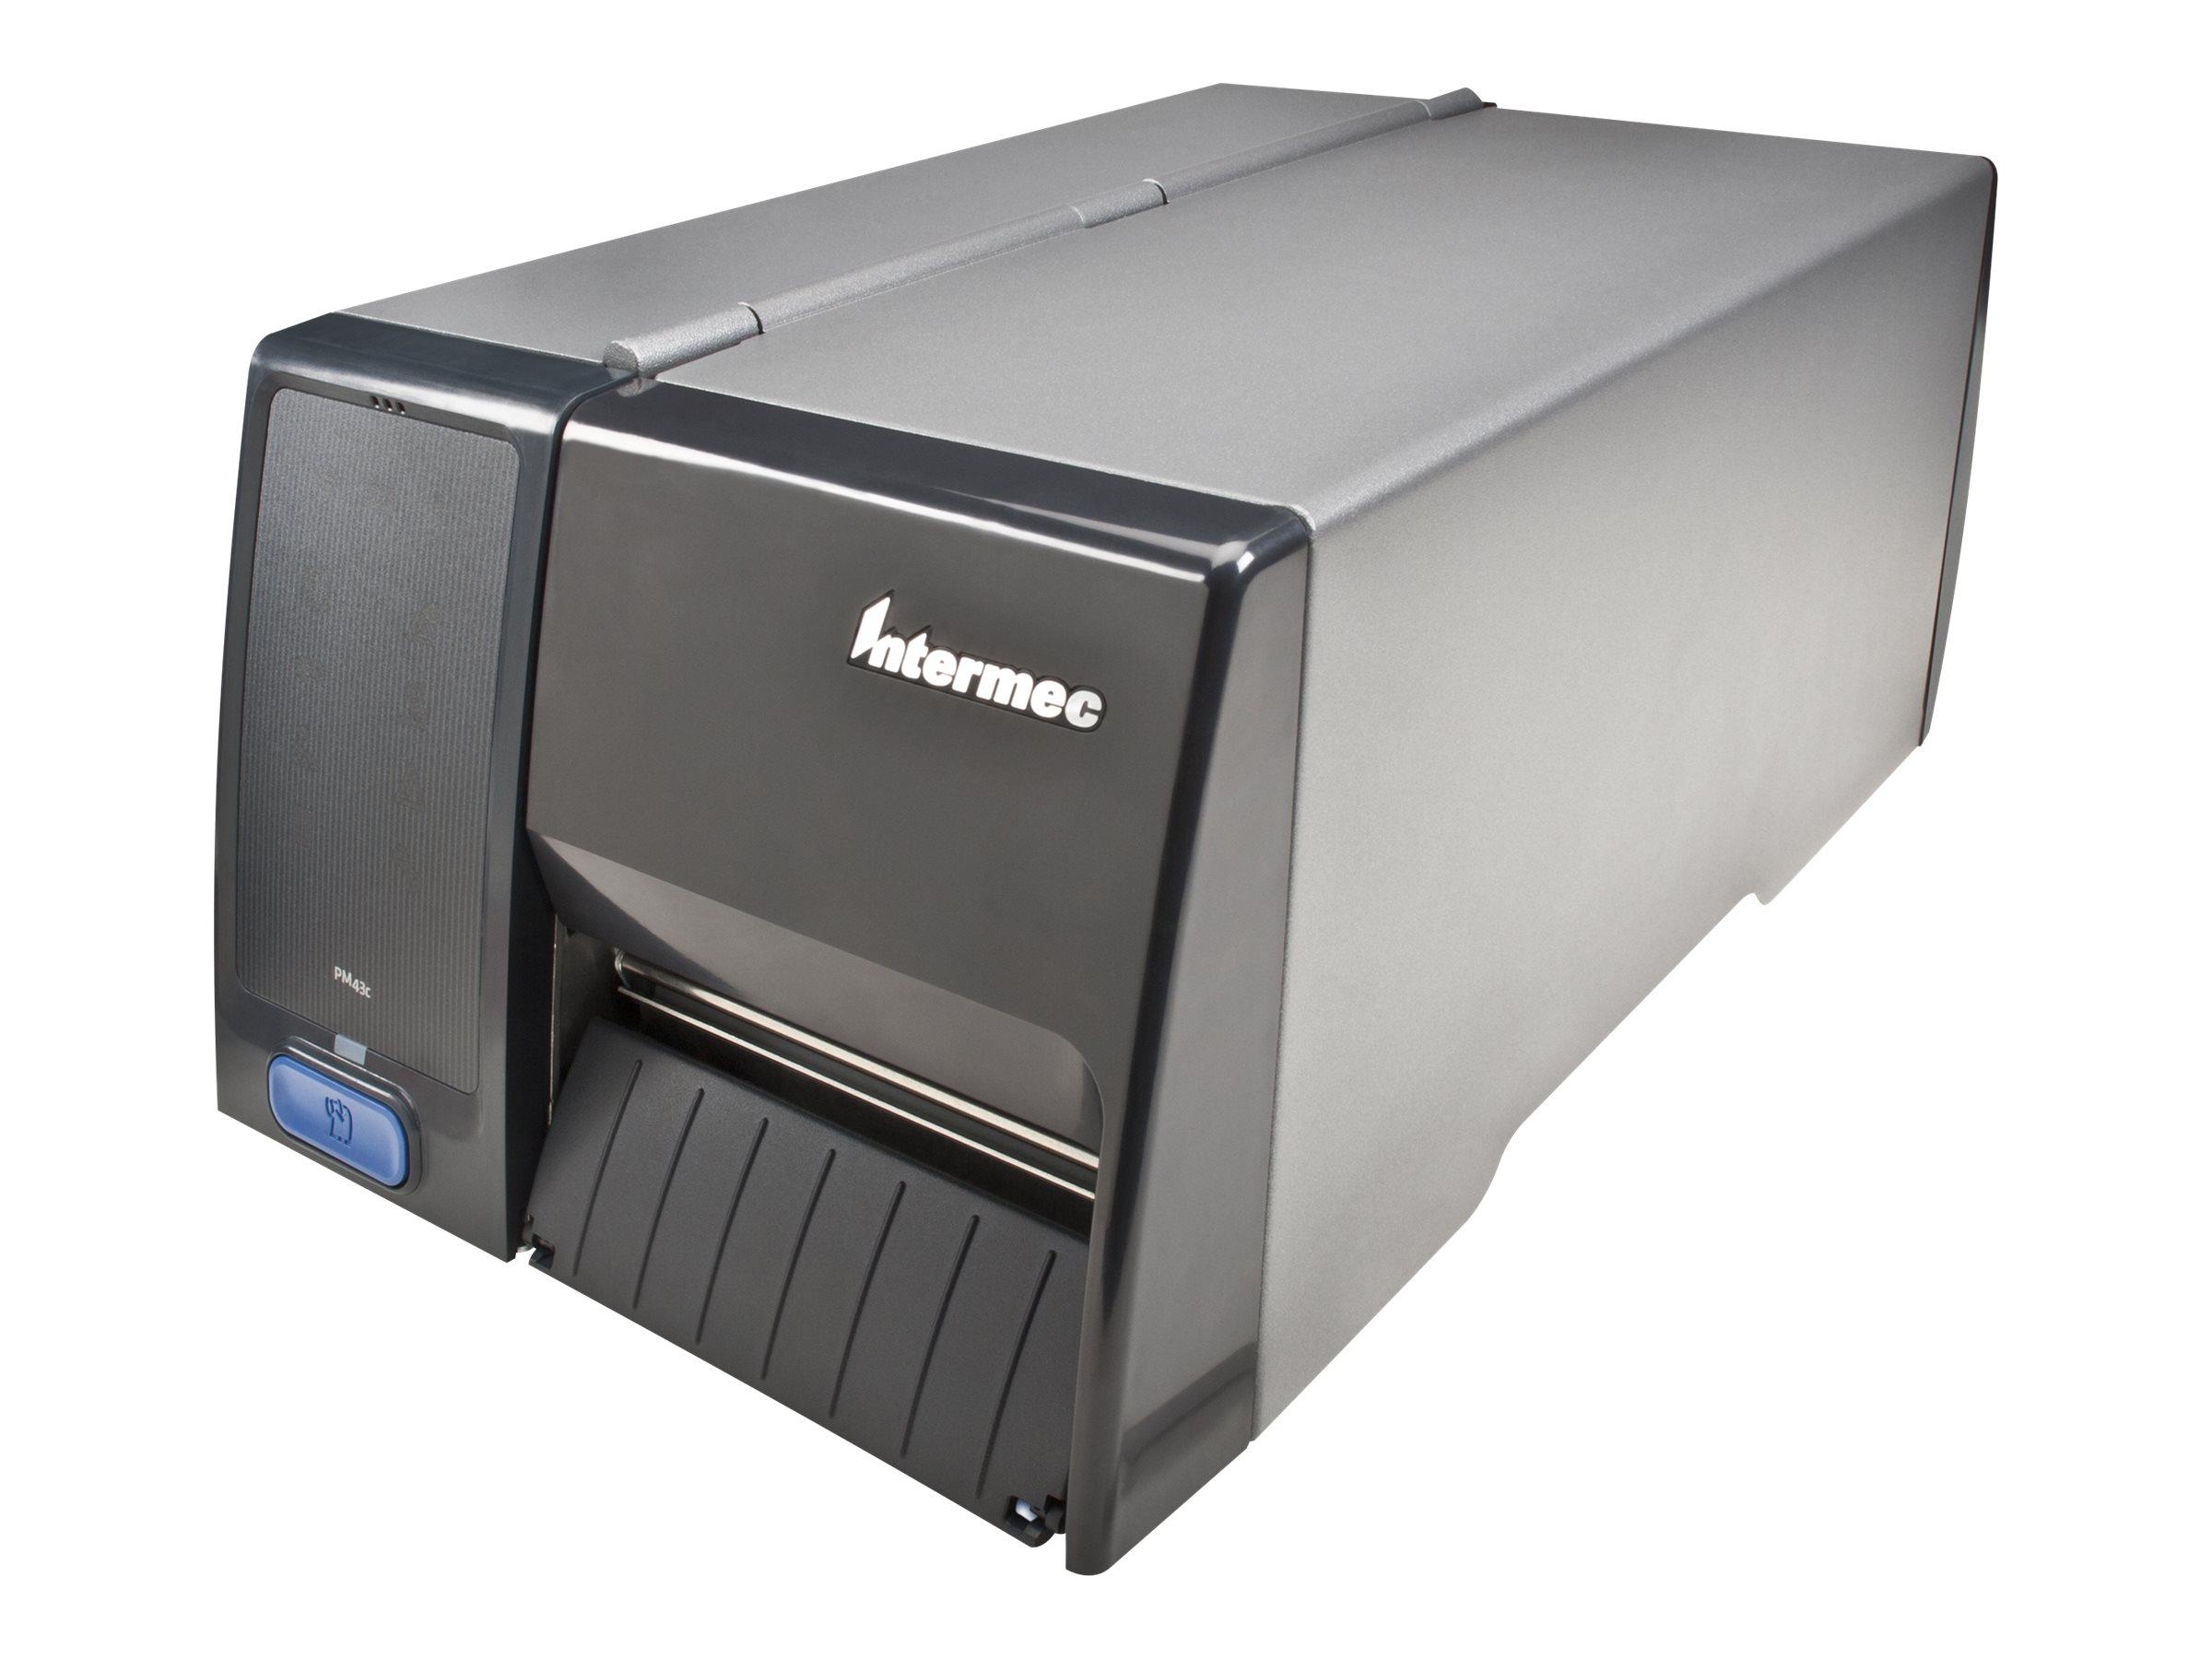 HONEYWELL PM43c - Etikettendrucker - Thermopapier - Rolle (11,4 cm)